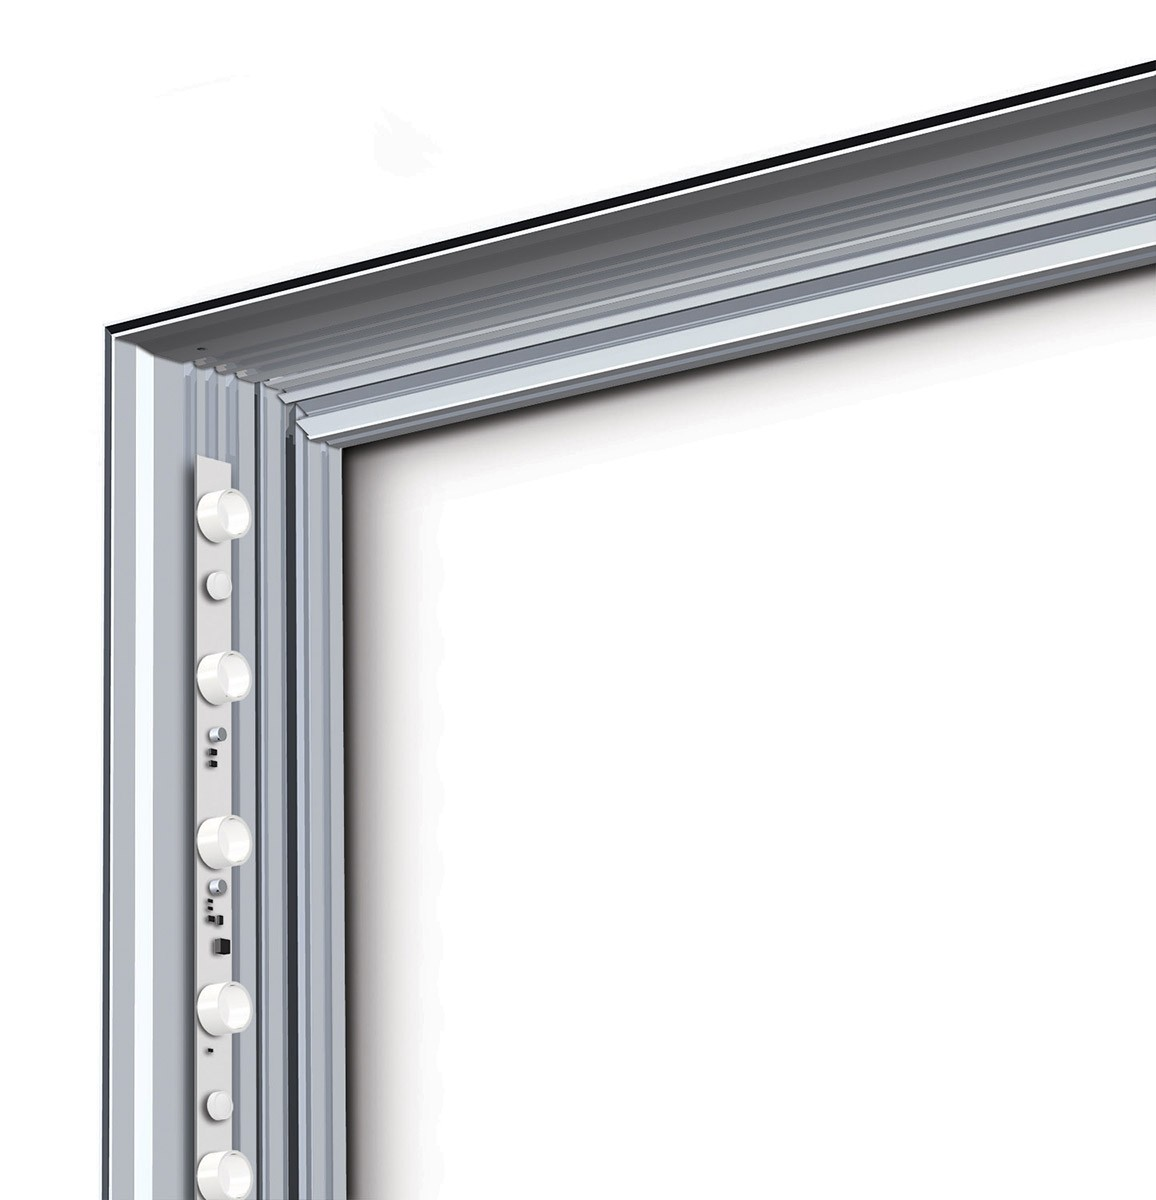 Charisma 48x72 Single Sided LED SEG Fabric Light Box